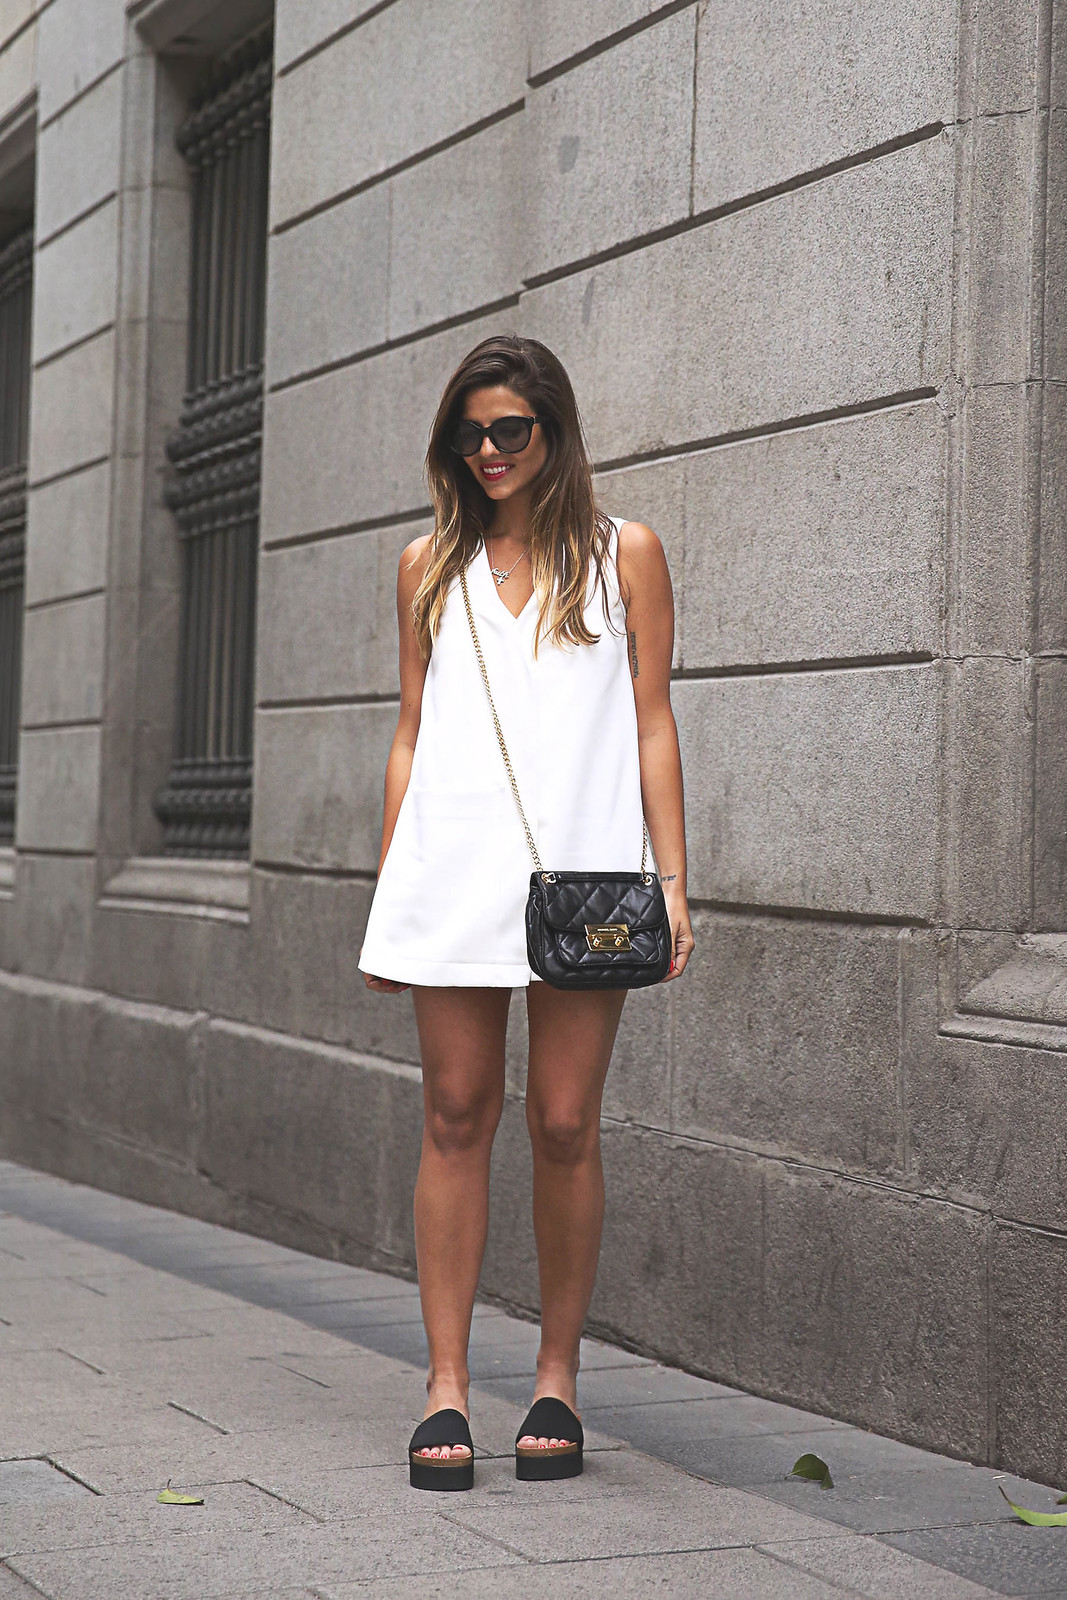 trendy-taste-look-outfit-street-style-ootd-blog-blogger-fashion-spain-moda-españa-steve-madden-mono-overall-playsuit-sandalias-michael-kors-white-blanco-4